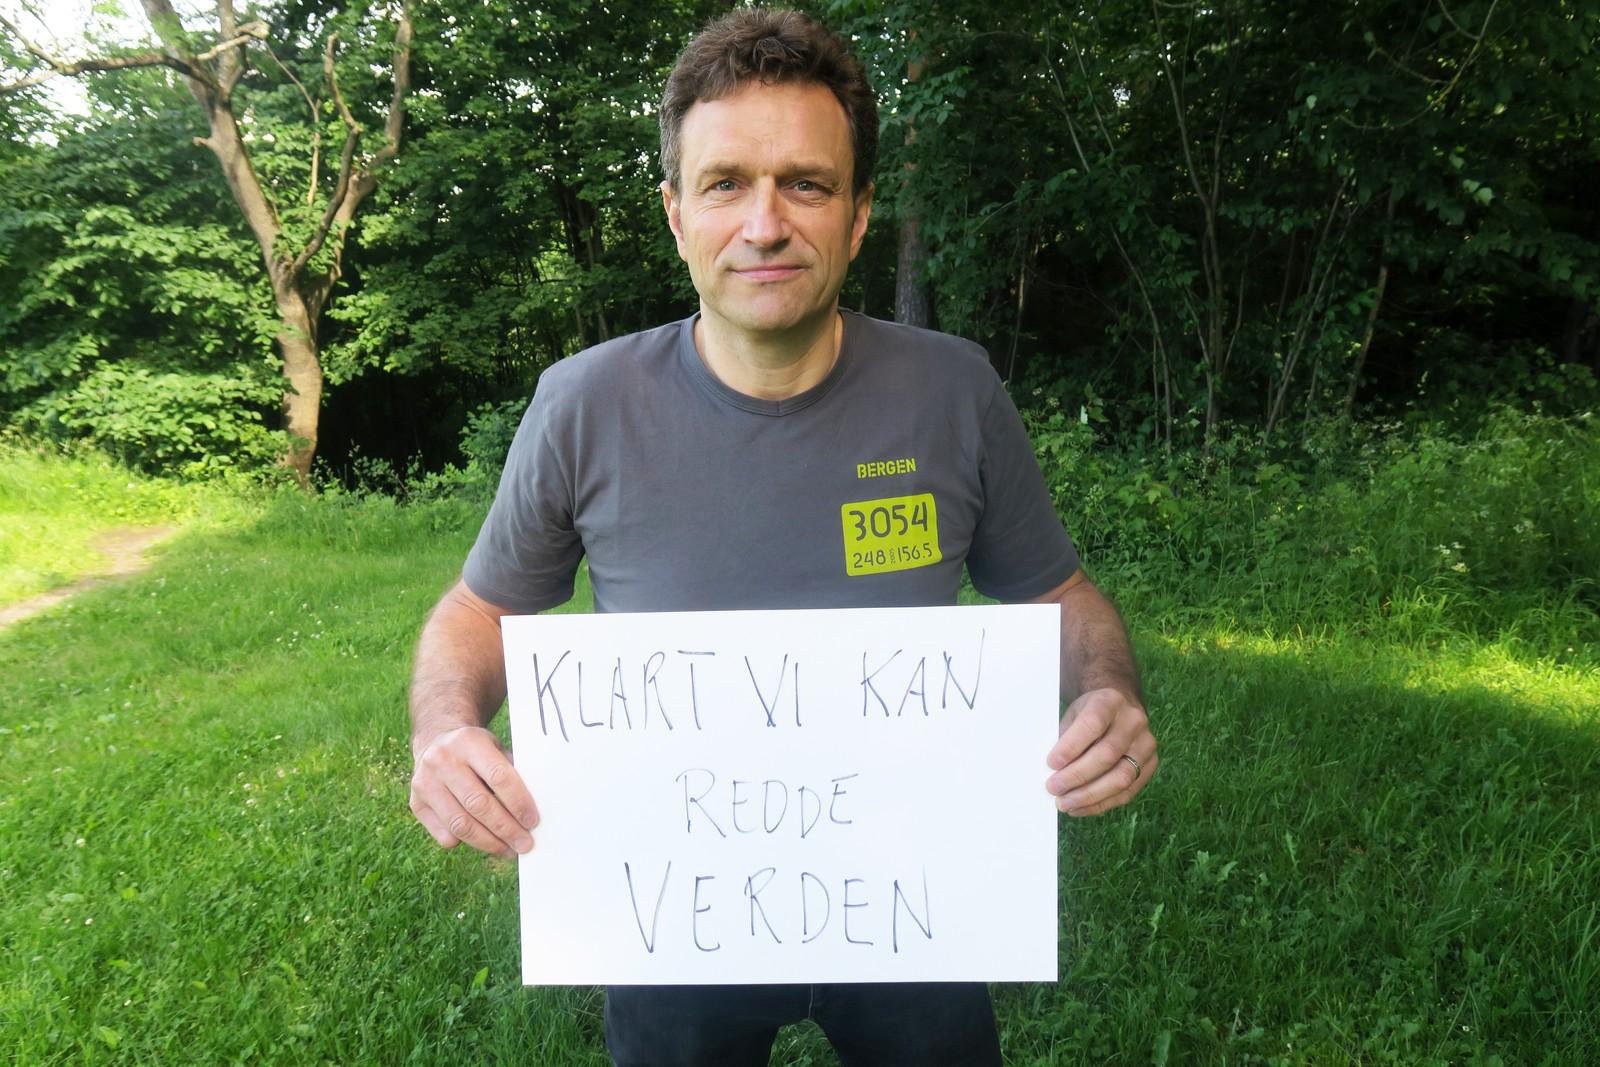 ARILD HERMSTAD (MDG): «Klart vi kan redde verden».